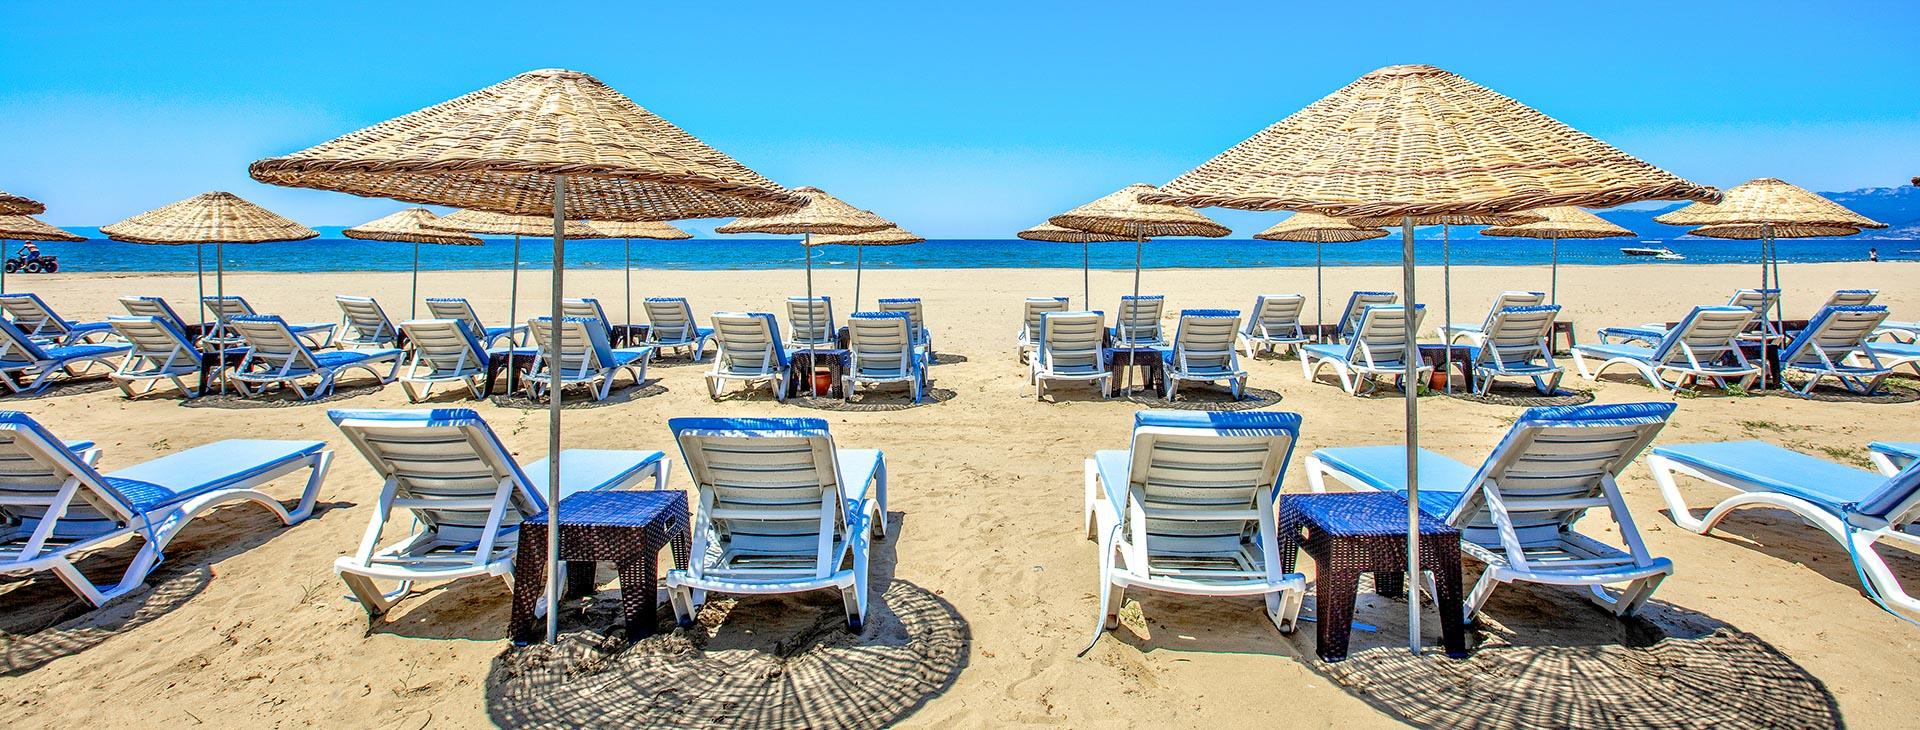 Korumar Ephesus Beach